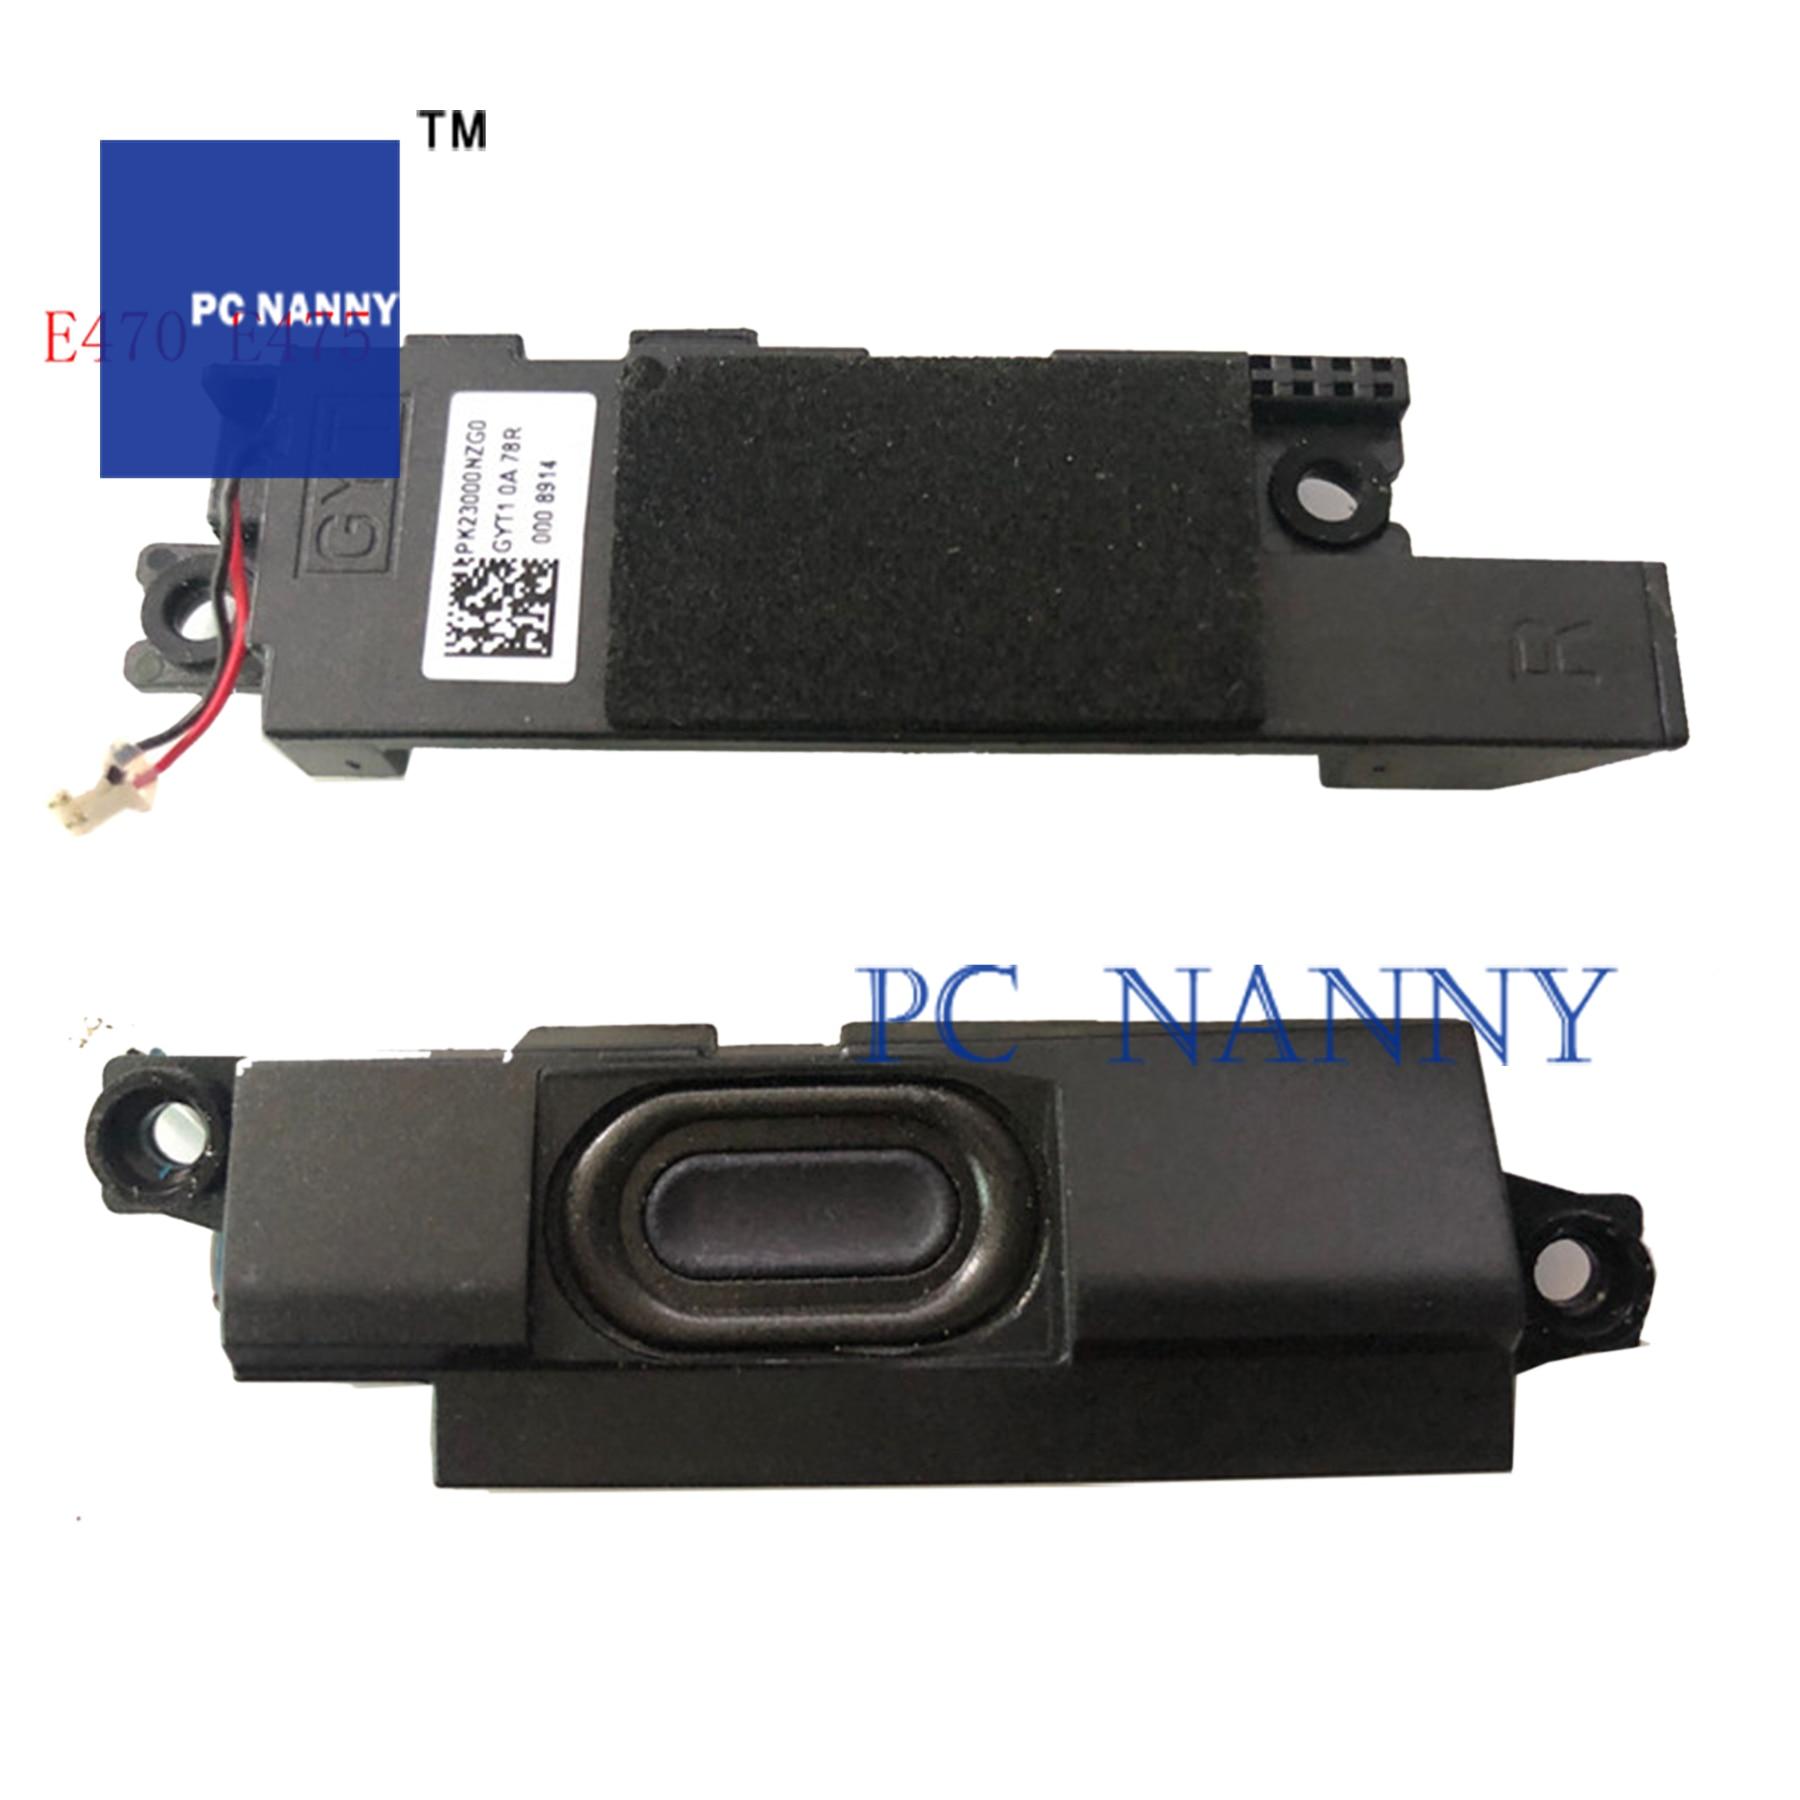 PCNANNY لباد E470 E475 E470c رئيس PK23000NXG0 PK23000NZG0 مفصلات AM11N000100/200 01lv739 01hw723 كاميرا